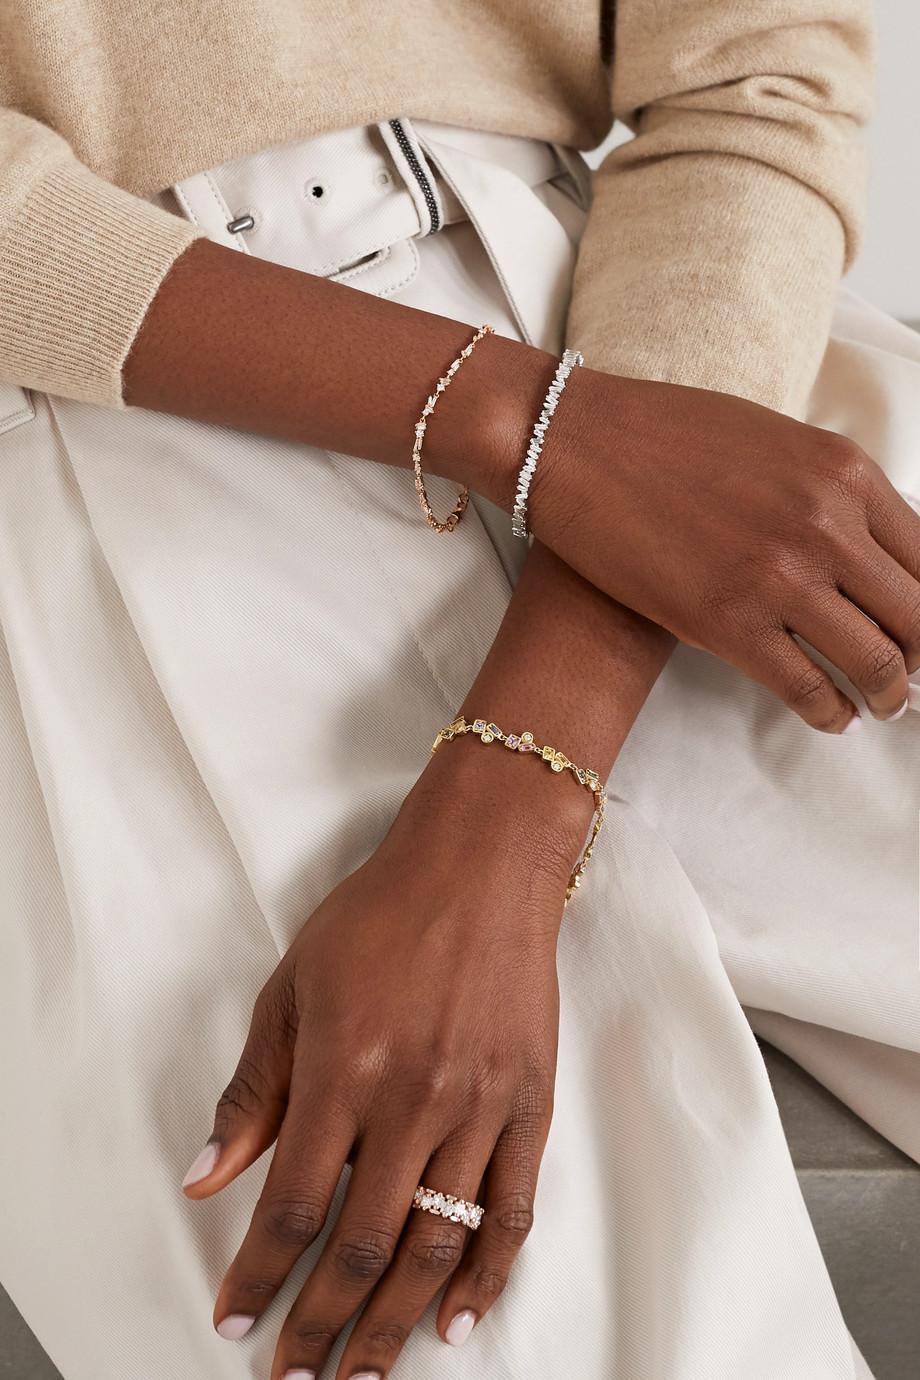 Suzanne Kalan 18-karat gold, diamond and sapphire bracelet